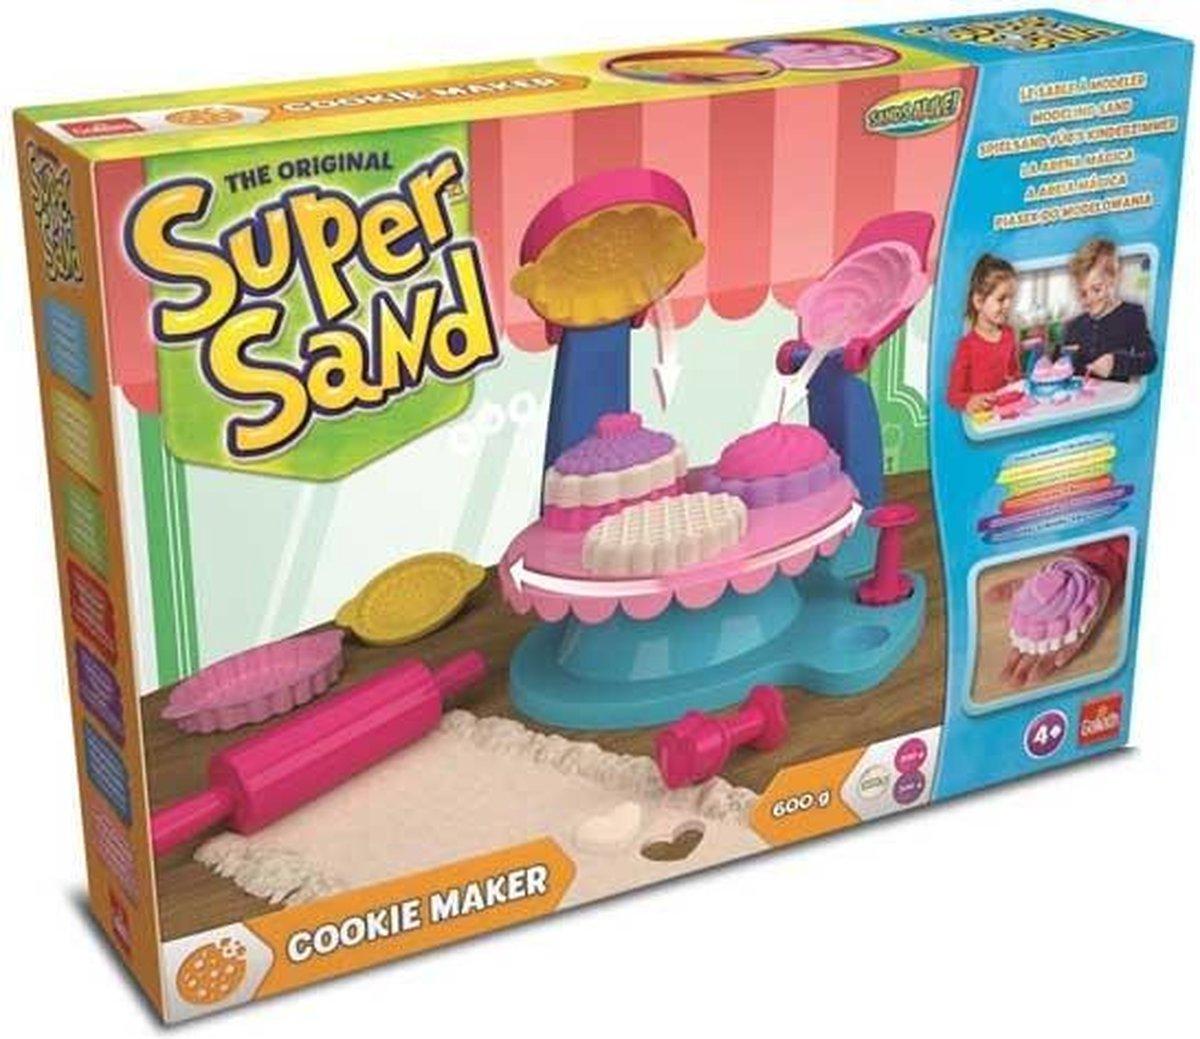 Super Sand Cookie Maker speelzand 8-delig